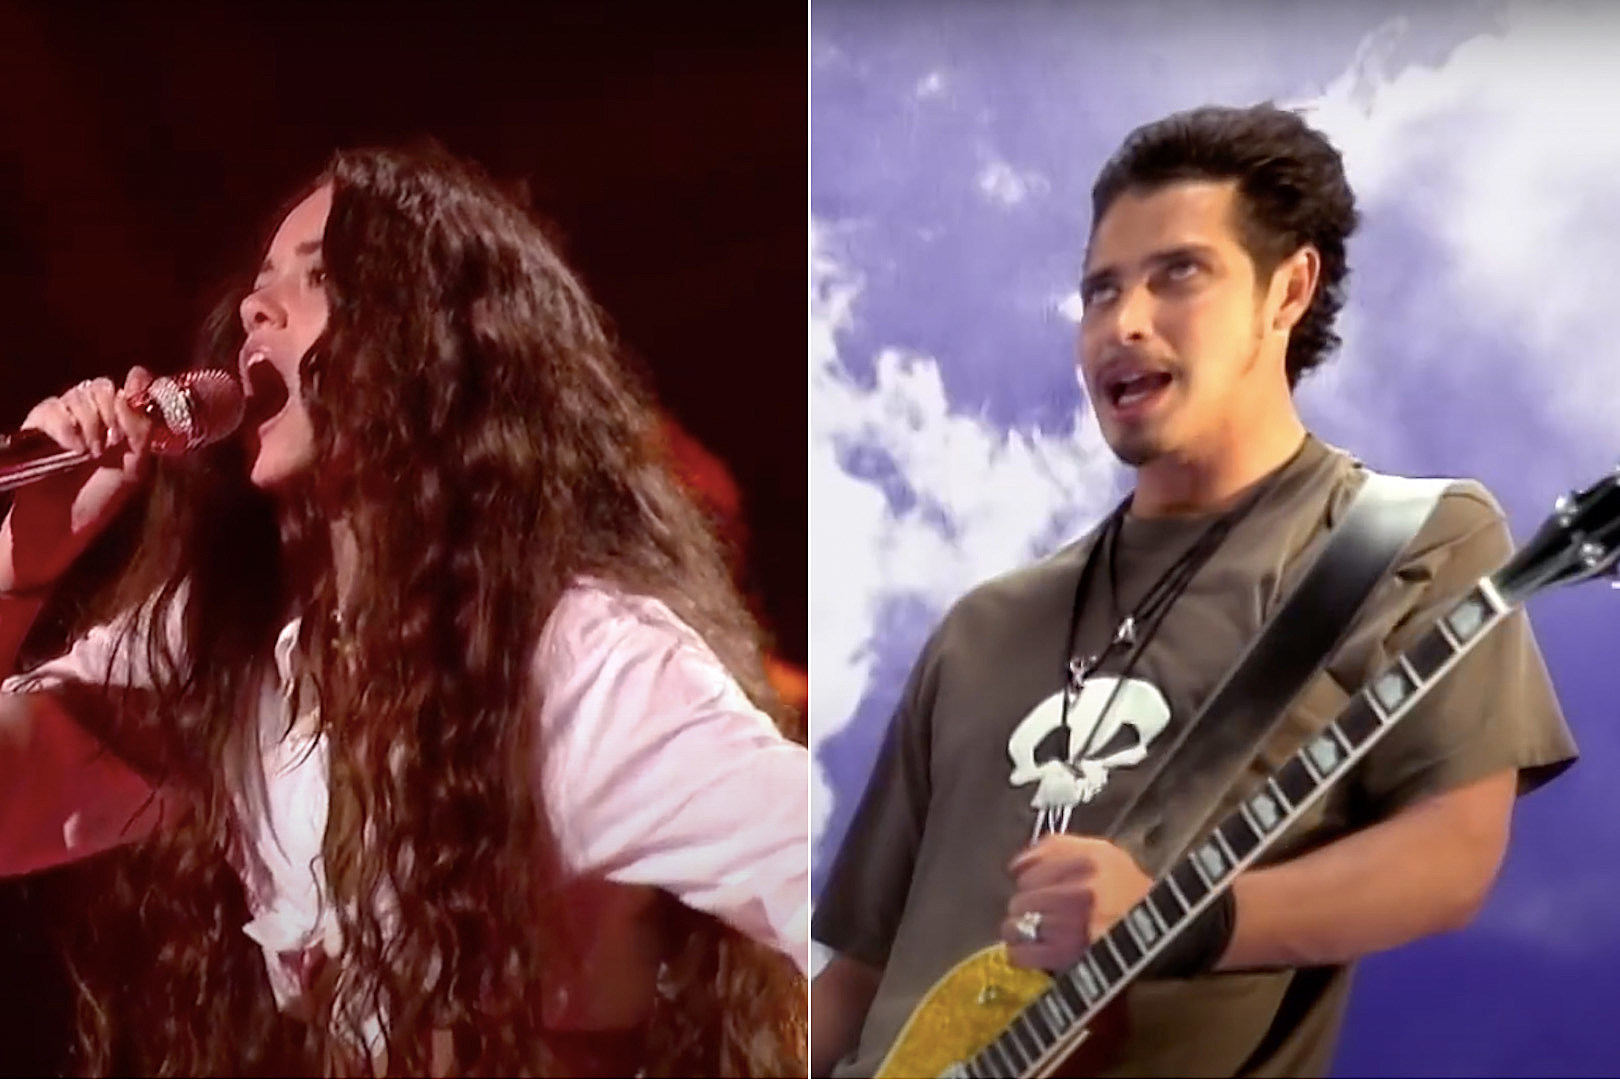 Teenager Covers Soundgarden's 'Black Hole Sun' on 'American Idol'